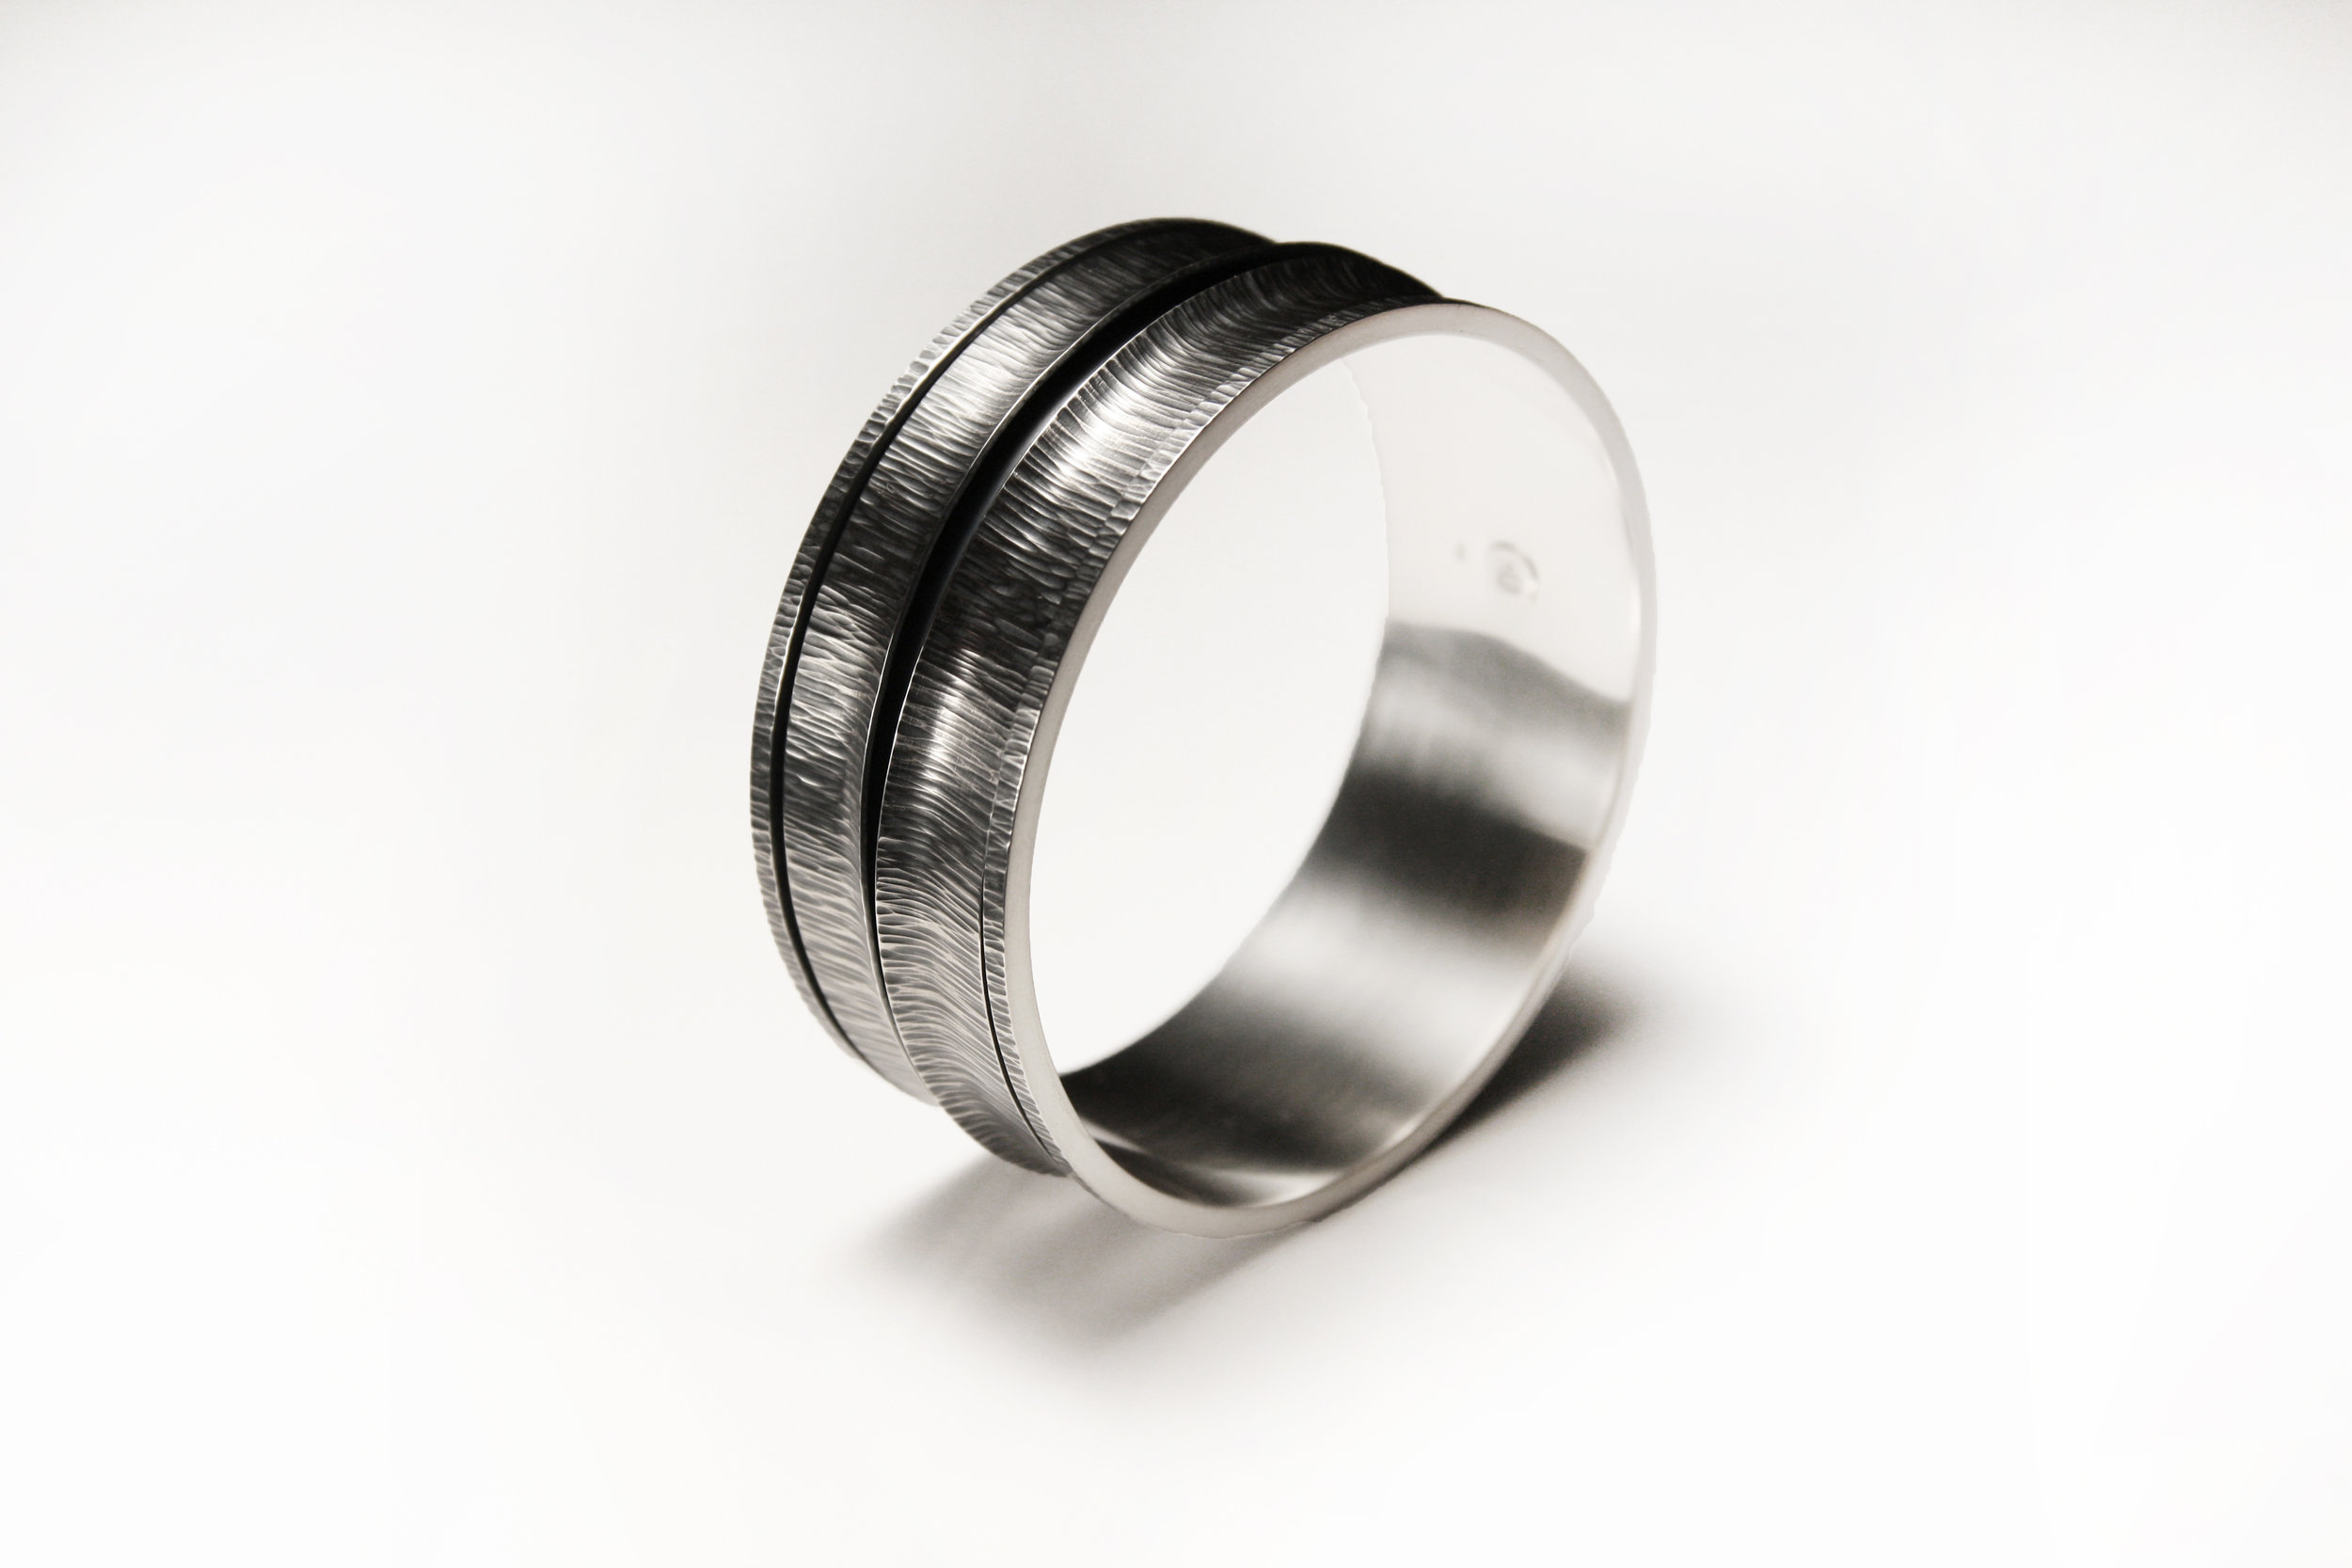 medium_revolving_bracelet_2_light.jpg